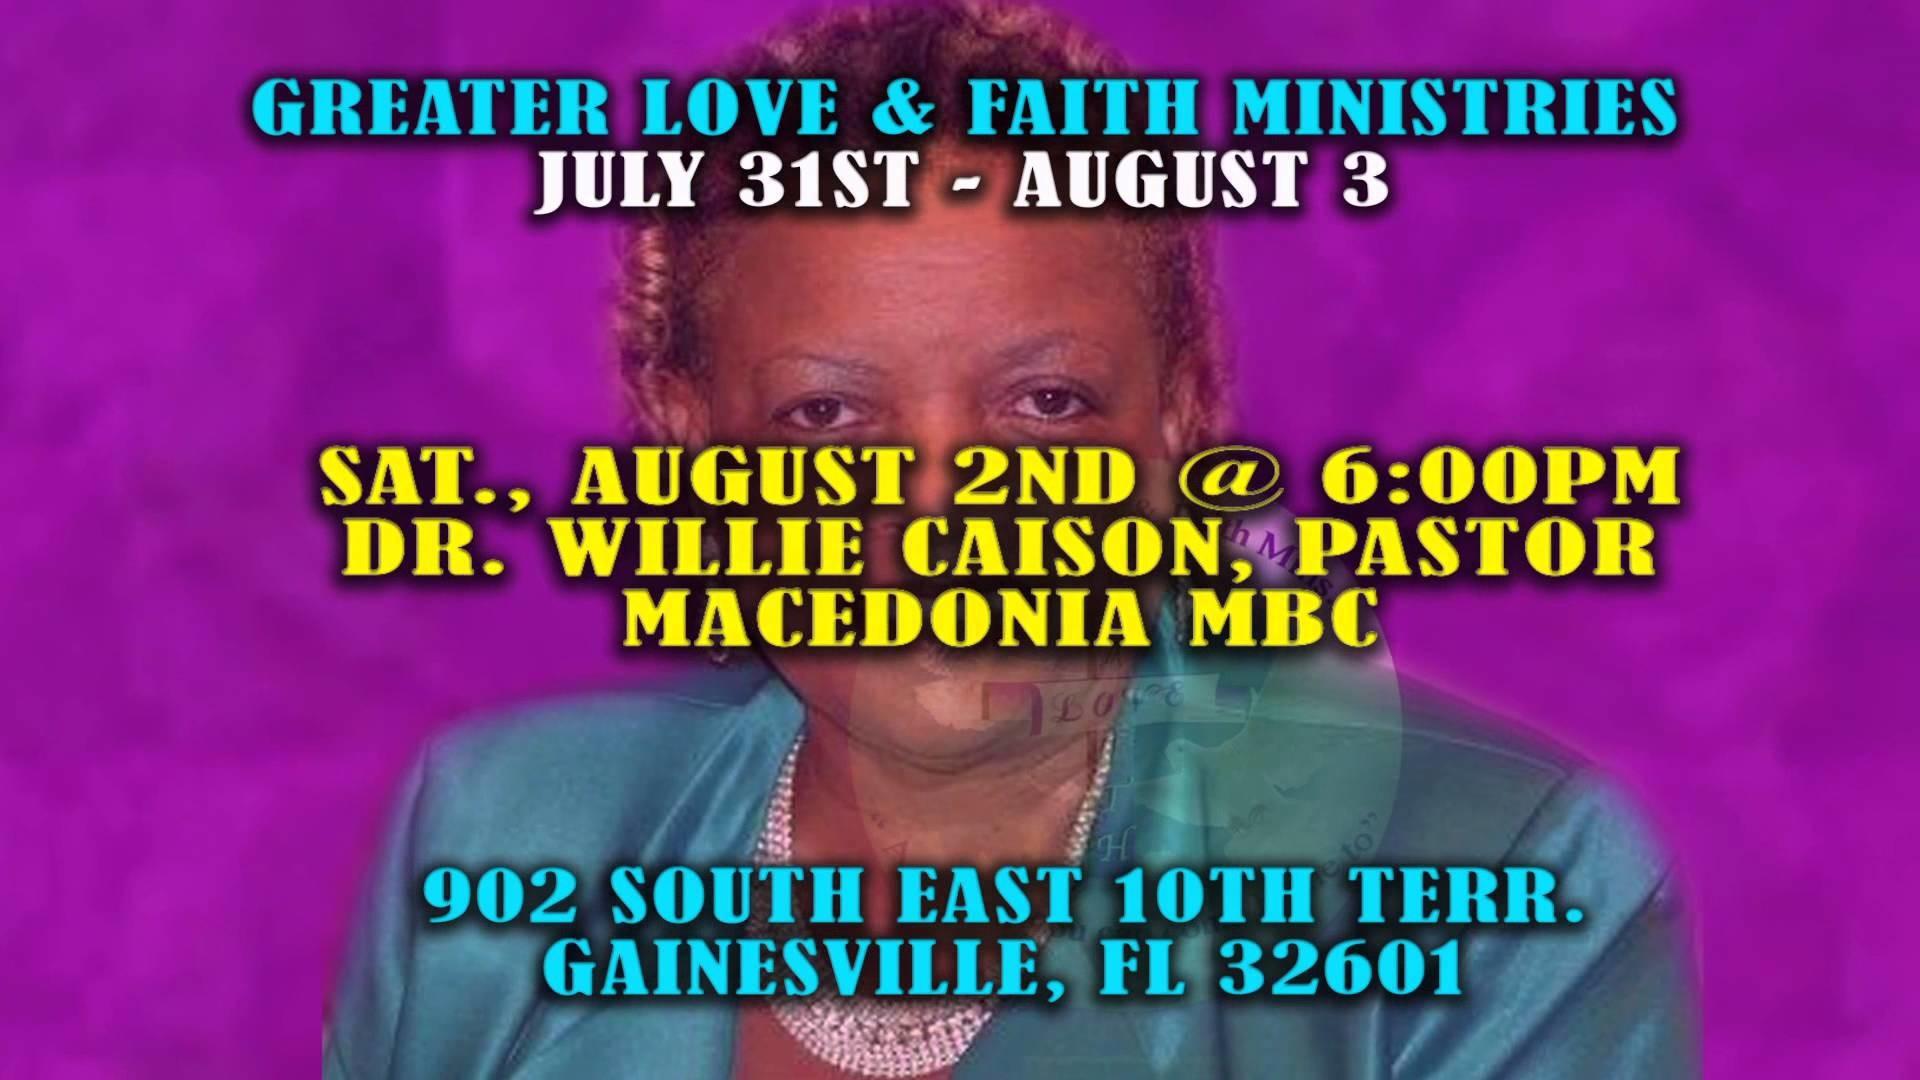 Greater Love and Faith 3rd Church Anniversary